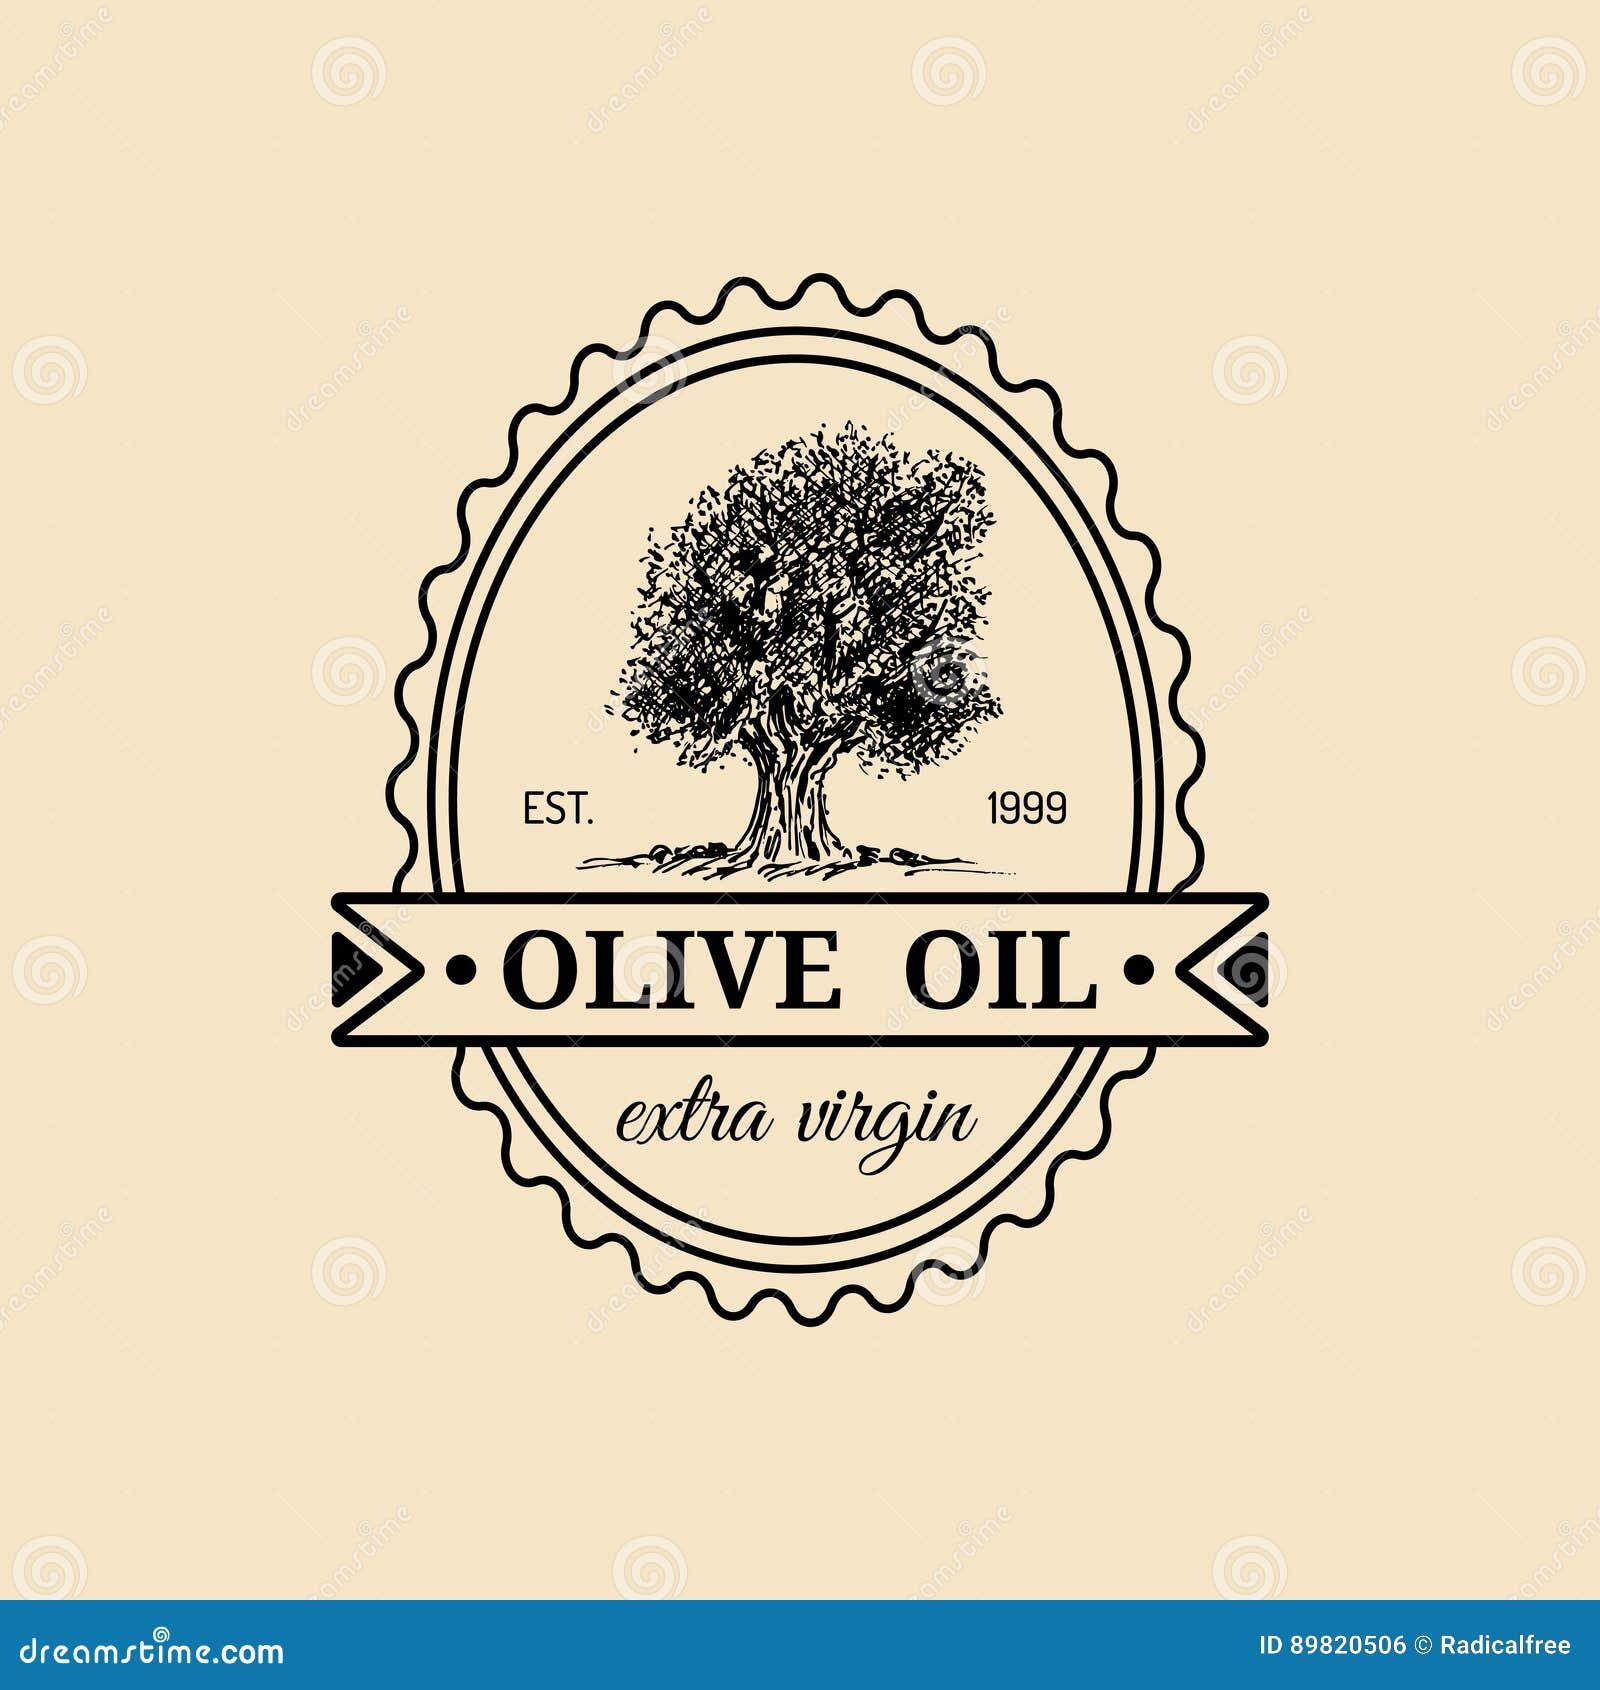 Vector vintage extra virgin olive oil logo. Retro emblem with tree. Hand sketched rural farm production sign.